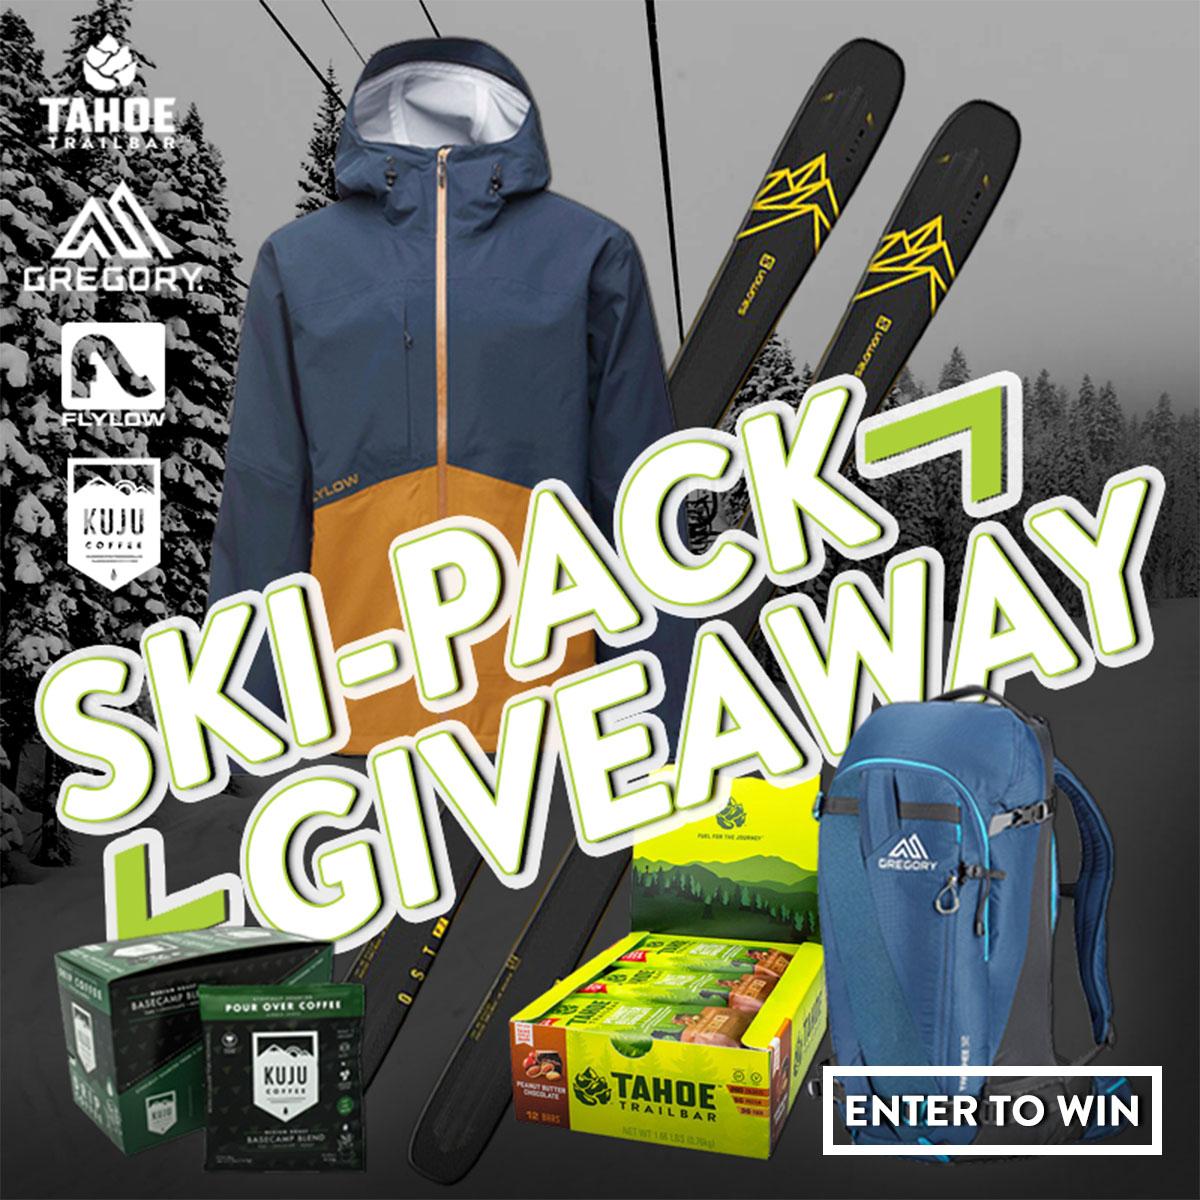 Ski-pack Giveaway